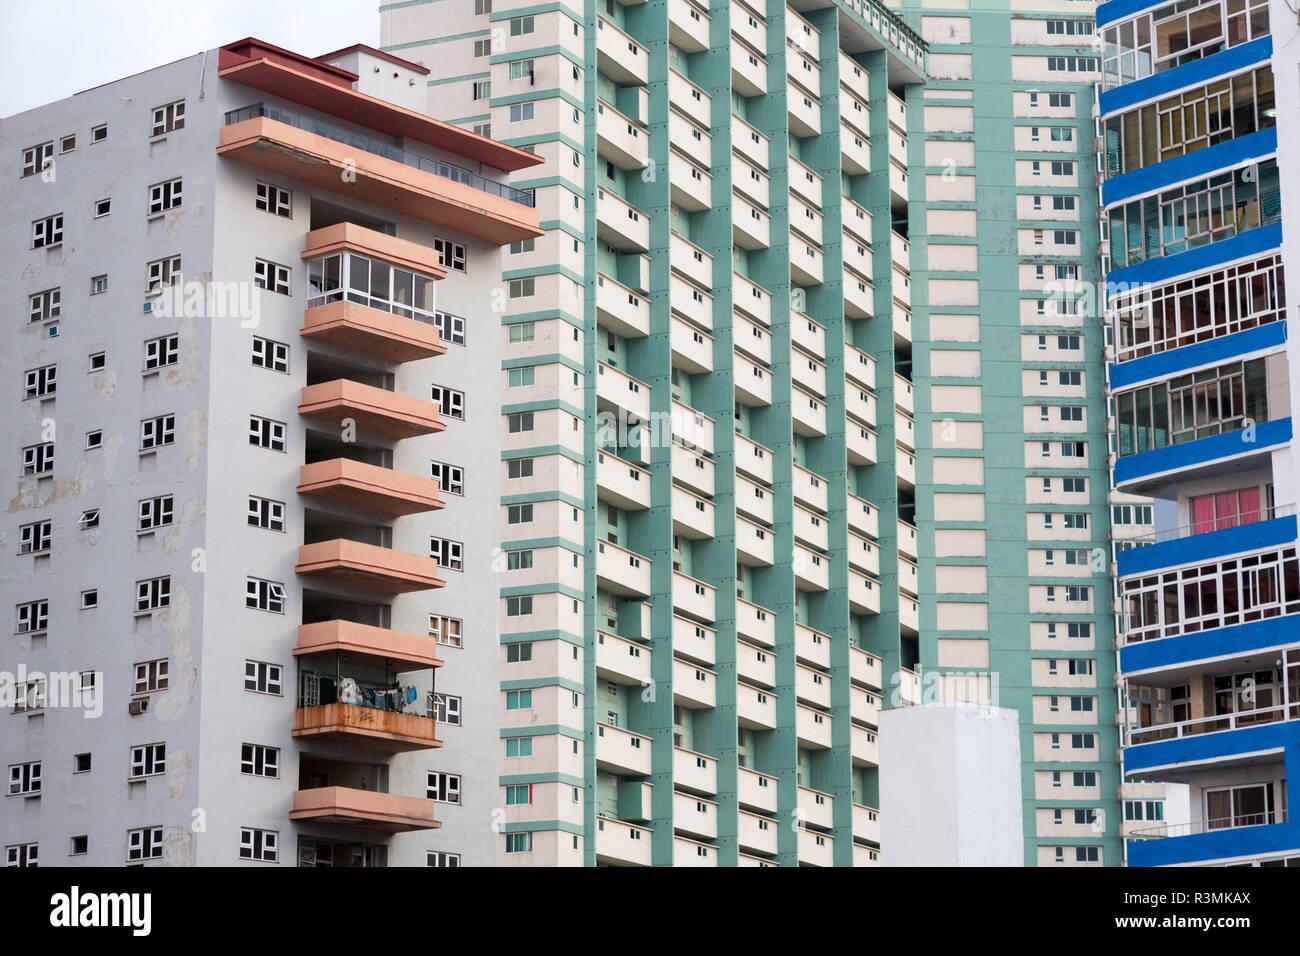 Cuba, Havana. Apartment building windows and balconies. Credit as: Wendy Kaveney / Jaynes Gallery / DanitaDelimont.com Stock Photo